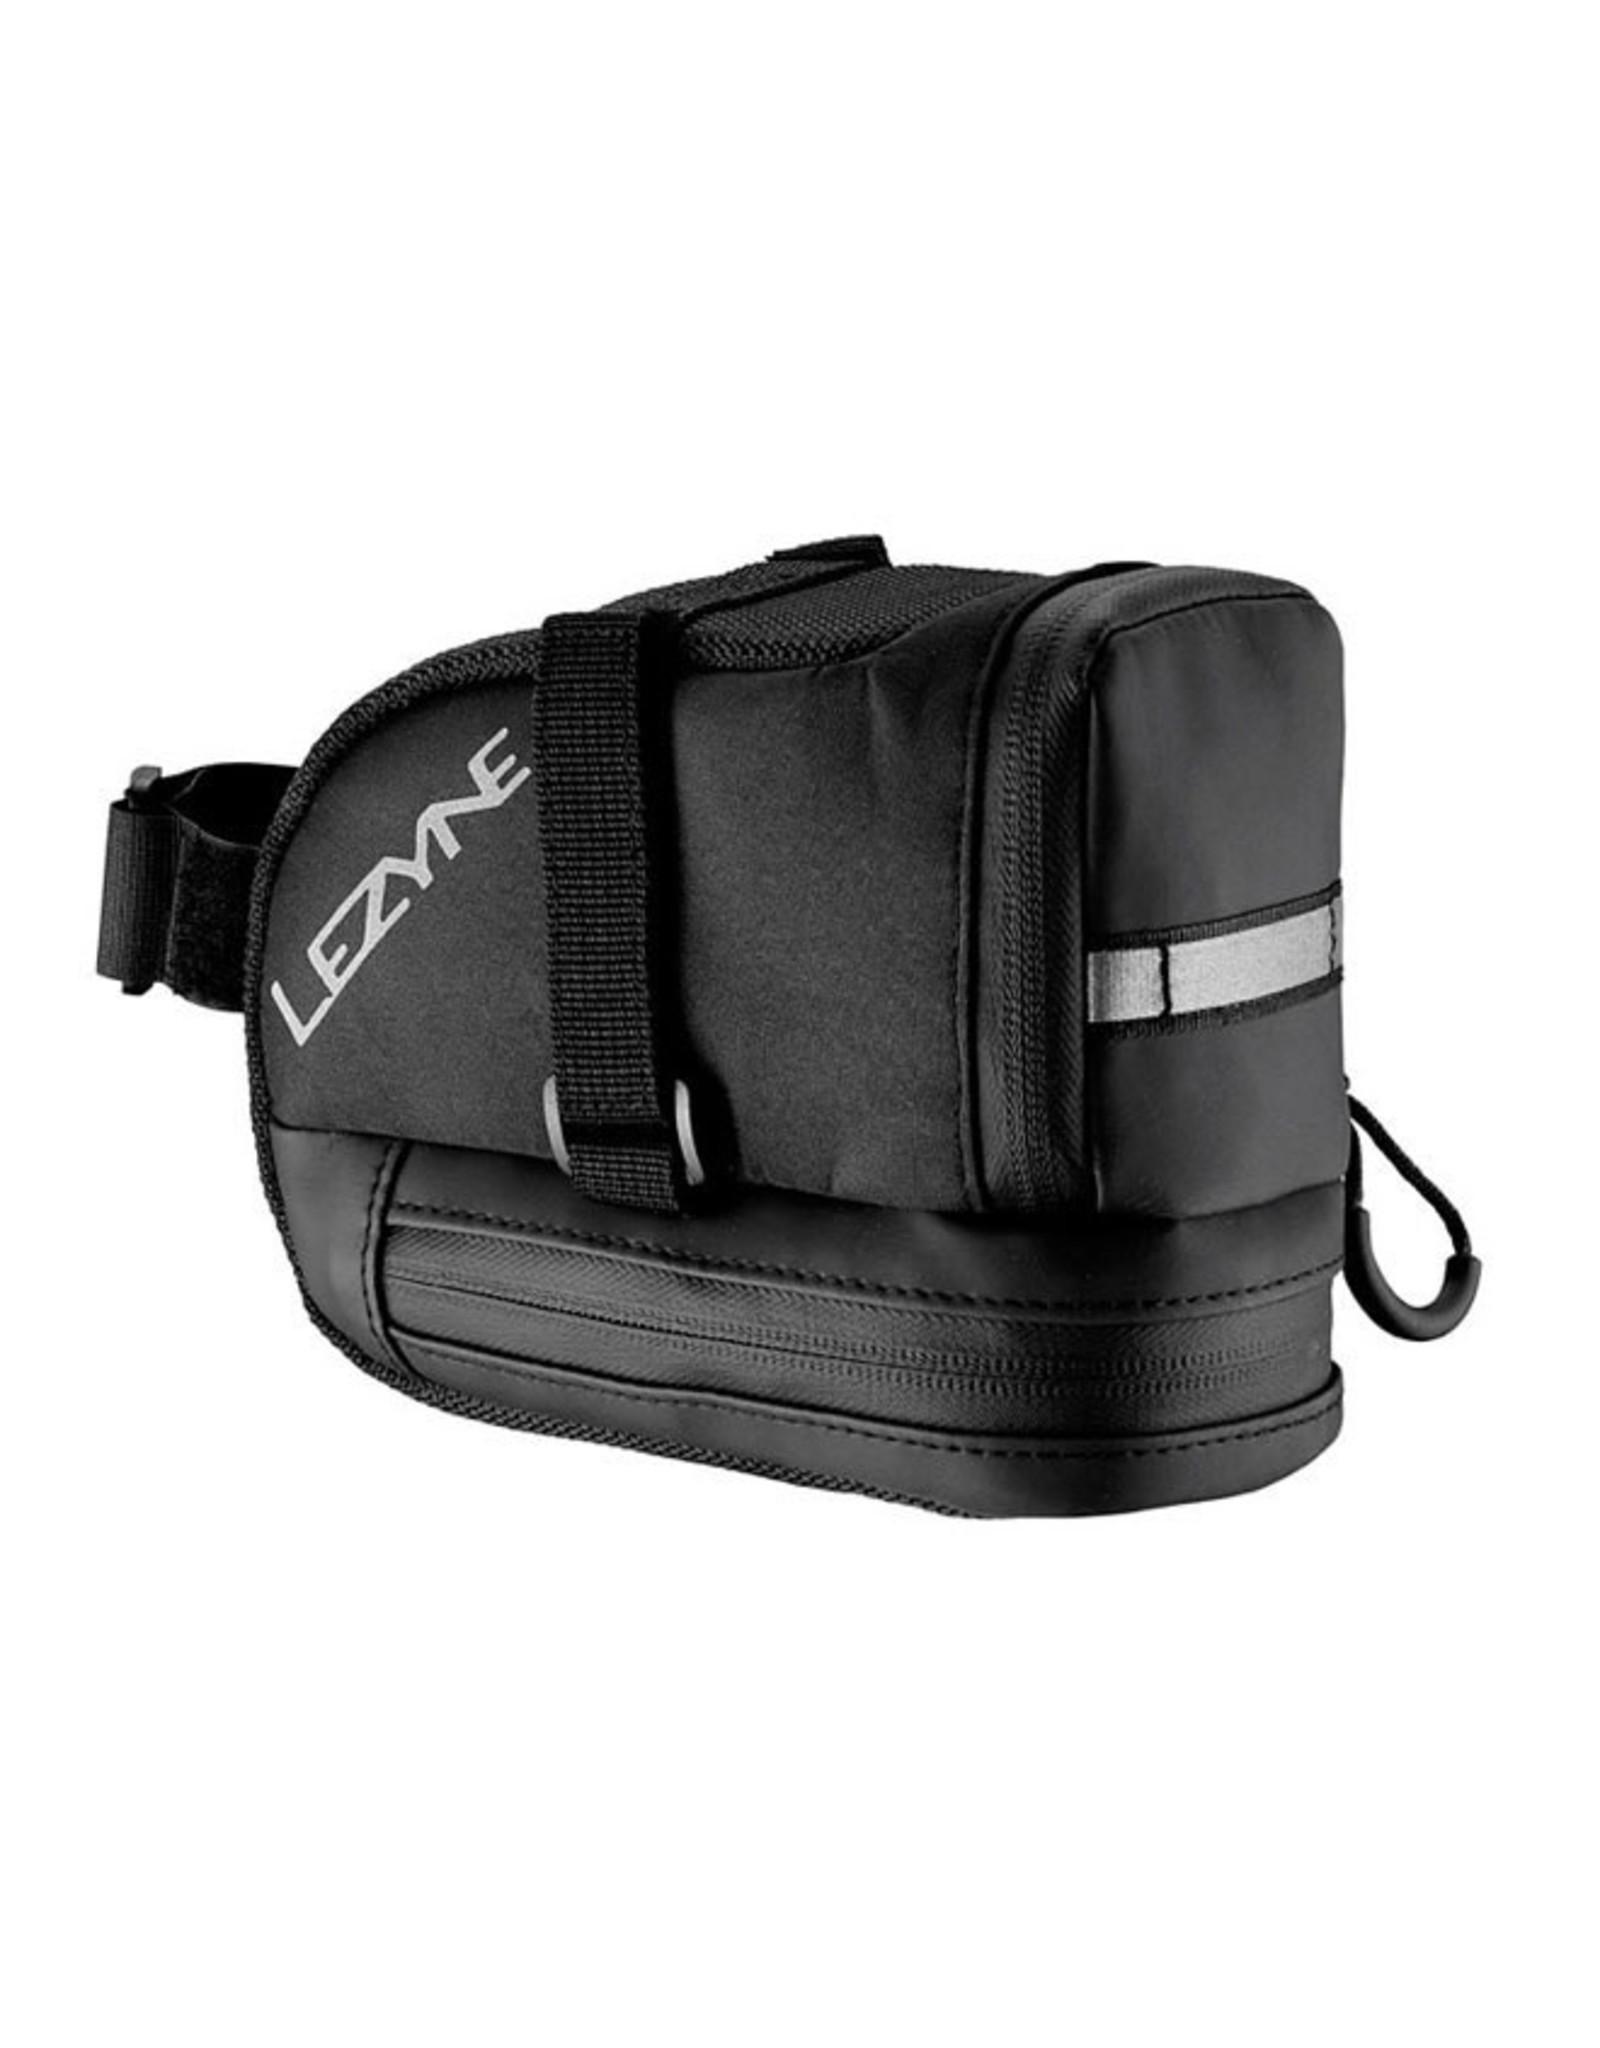 Lezyne Saddle Bag L-Caddy Black